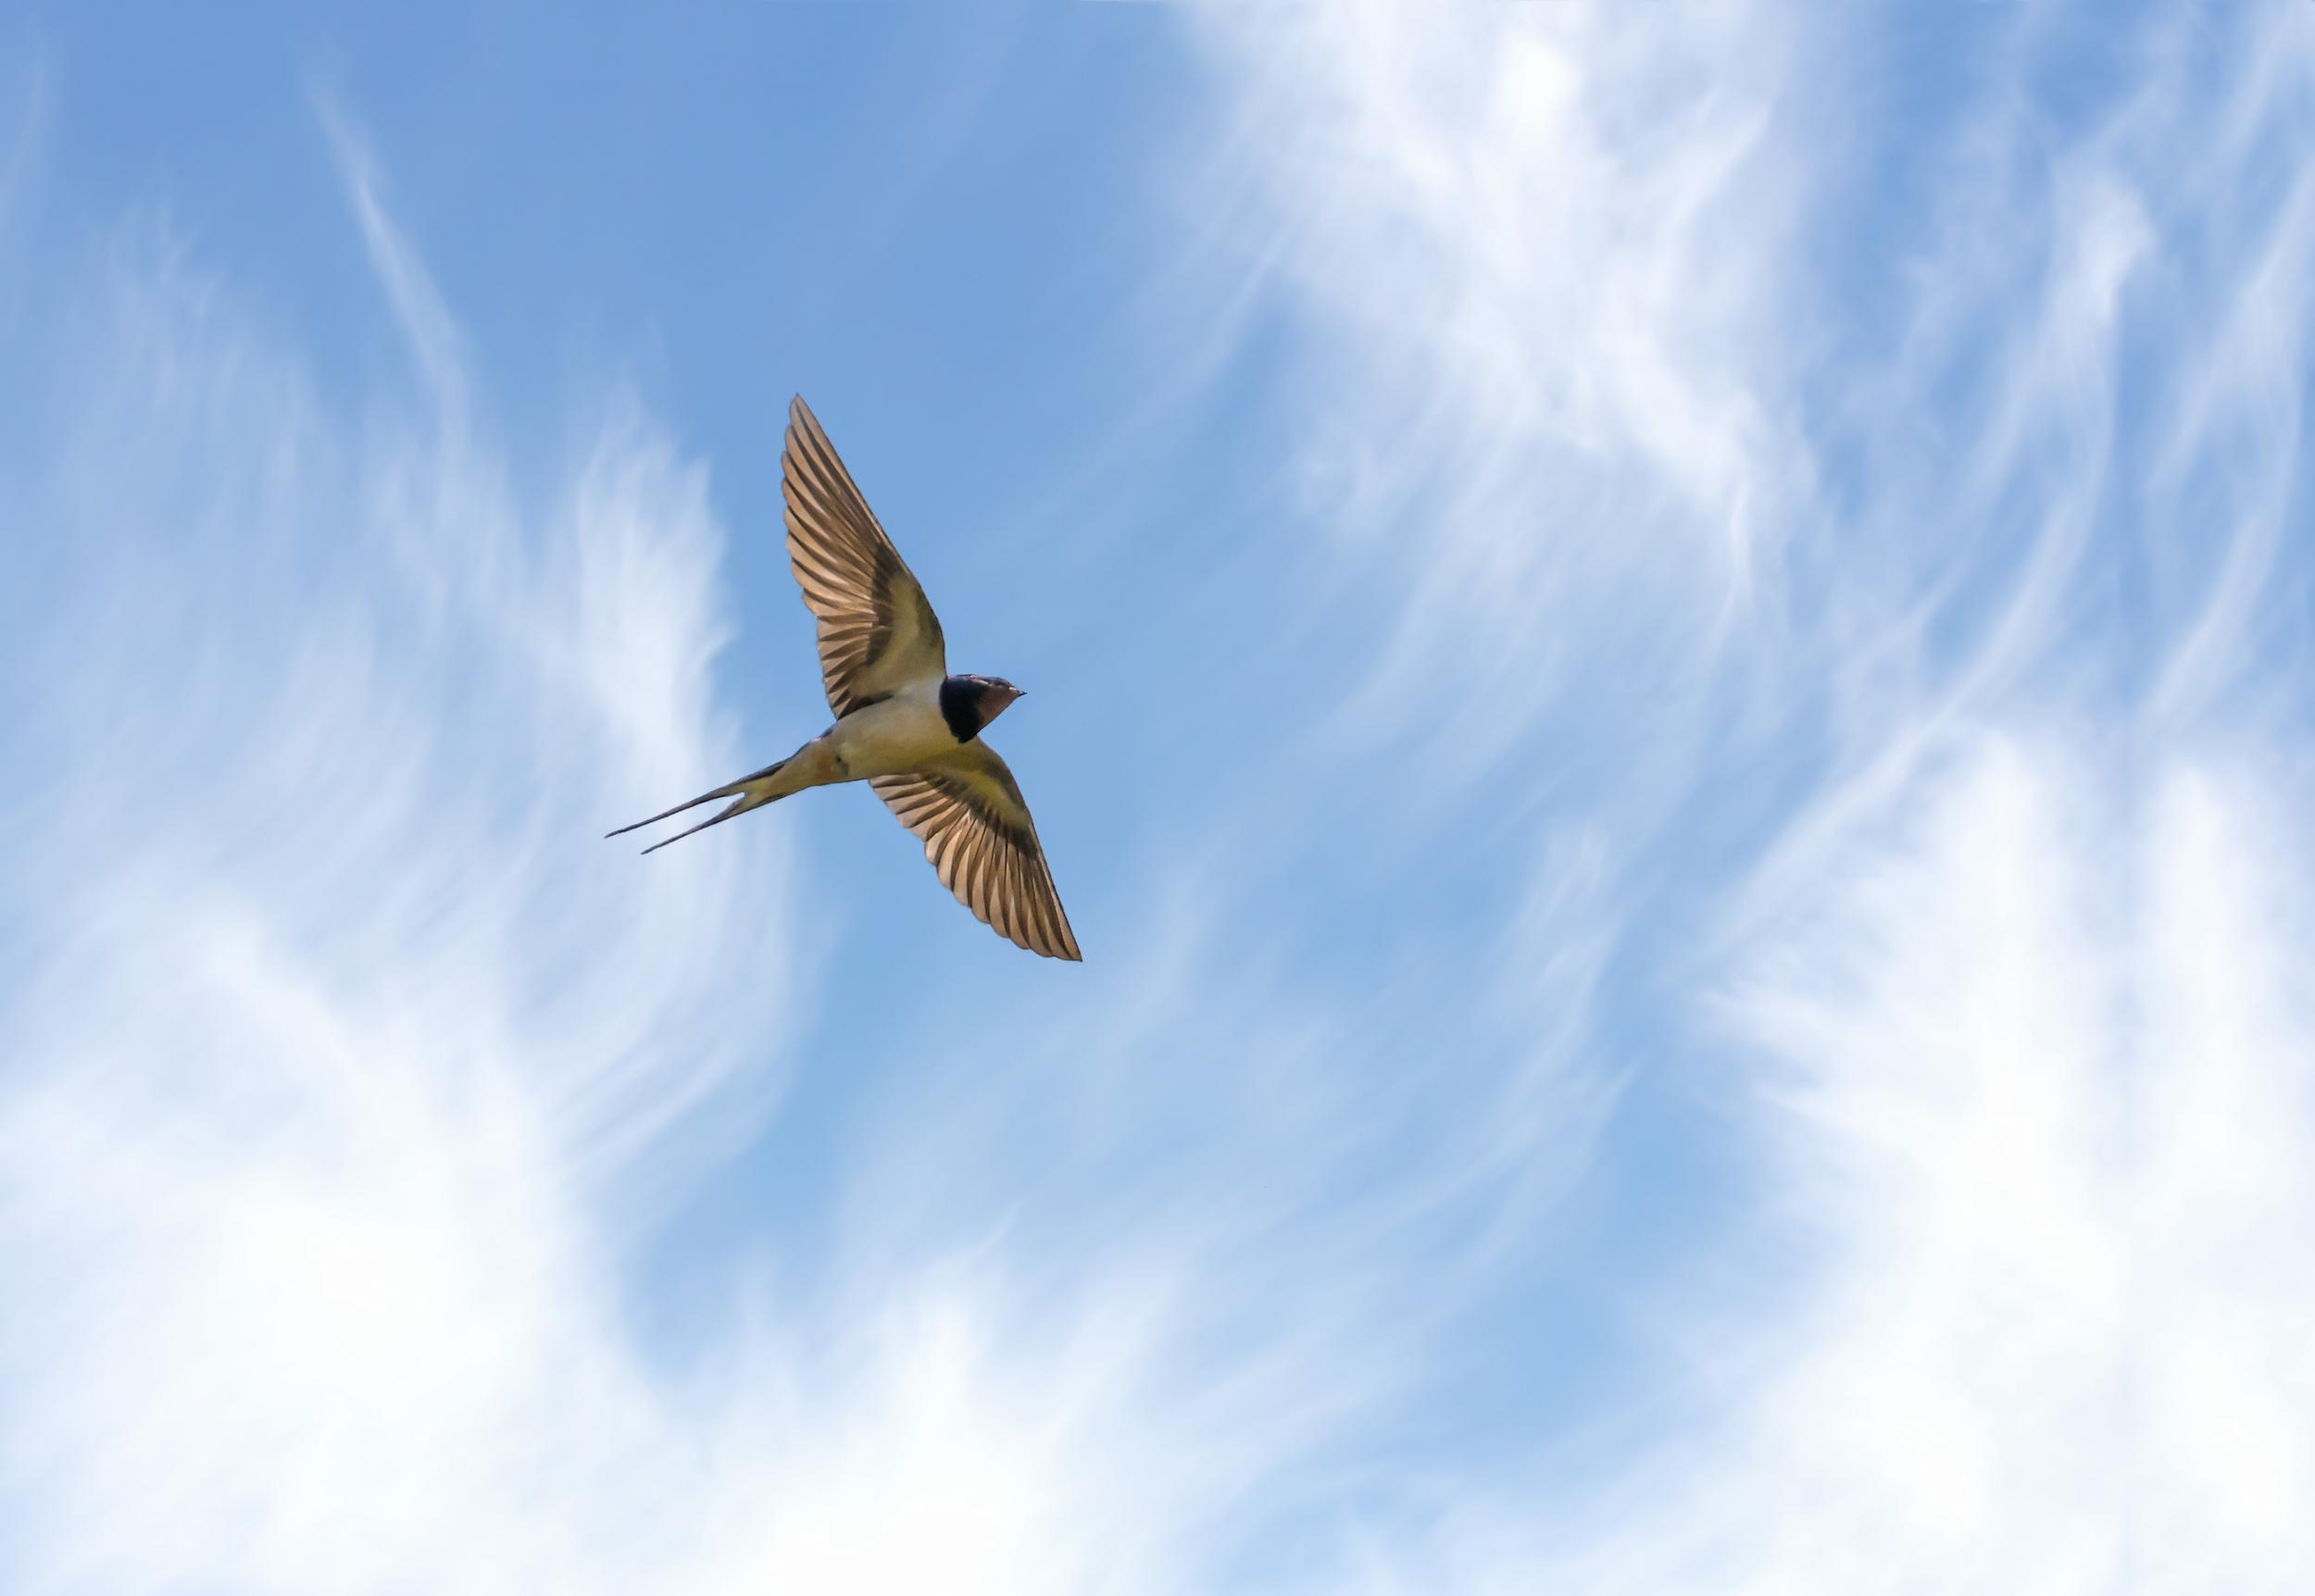 A Swallow flyover